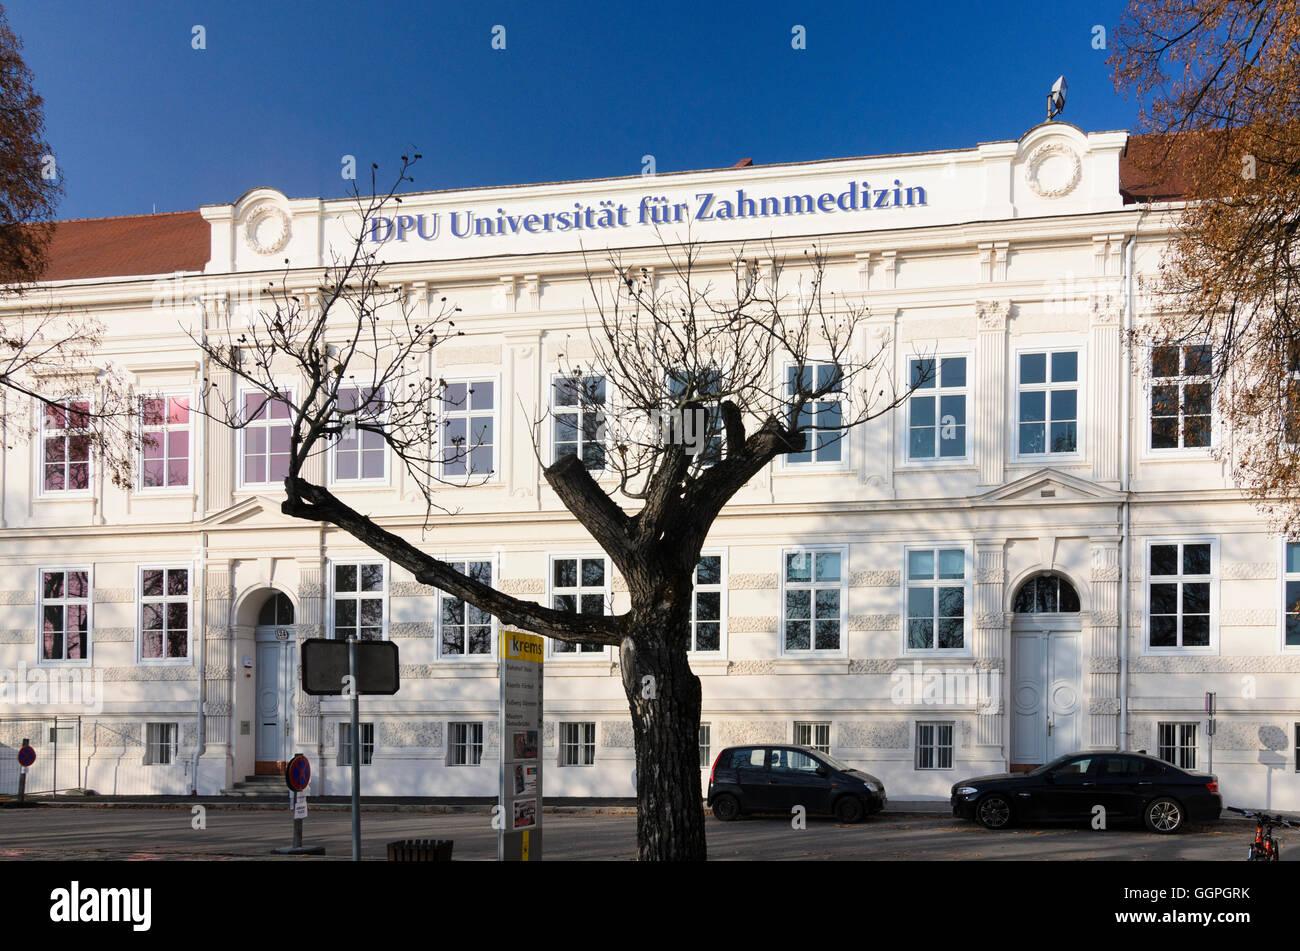 Krems An Der Donau Universitat Fur Zahnmedizin Osterreich Niederosterreich Niederosterreich Wachau Stockfotografie Alamy